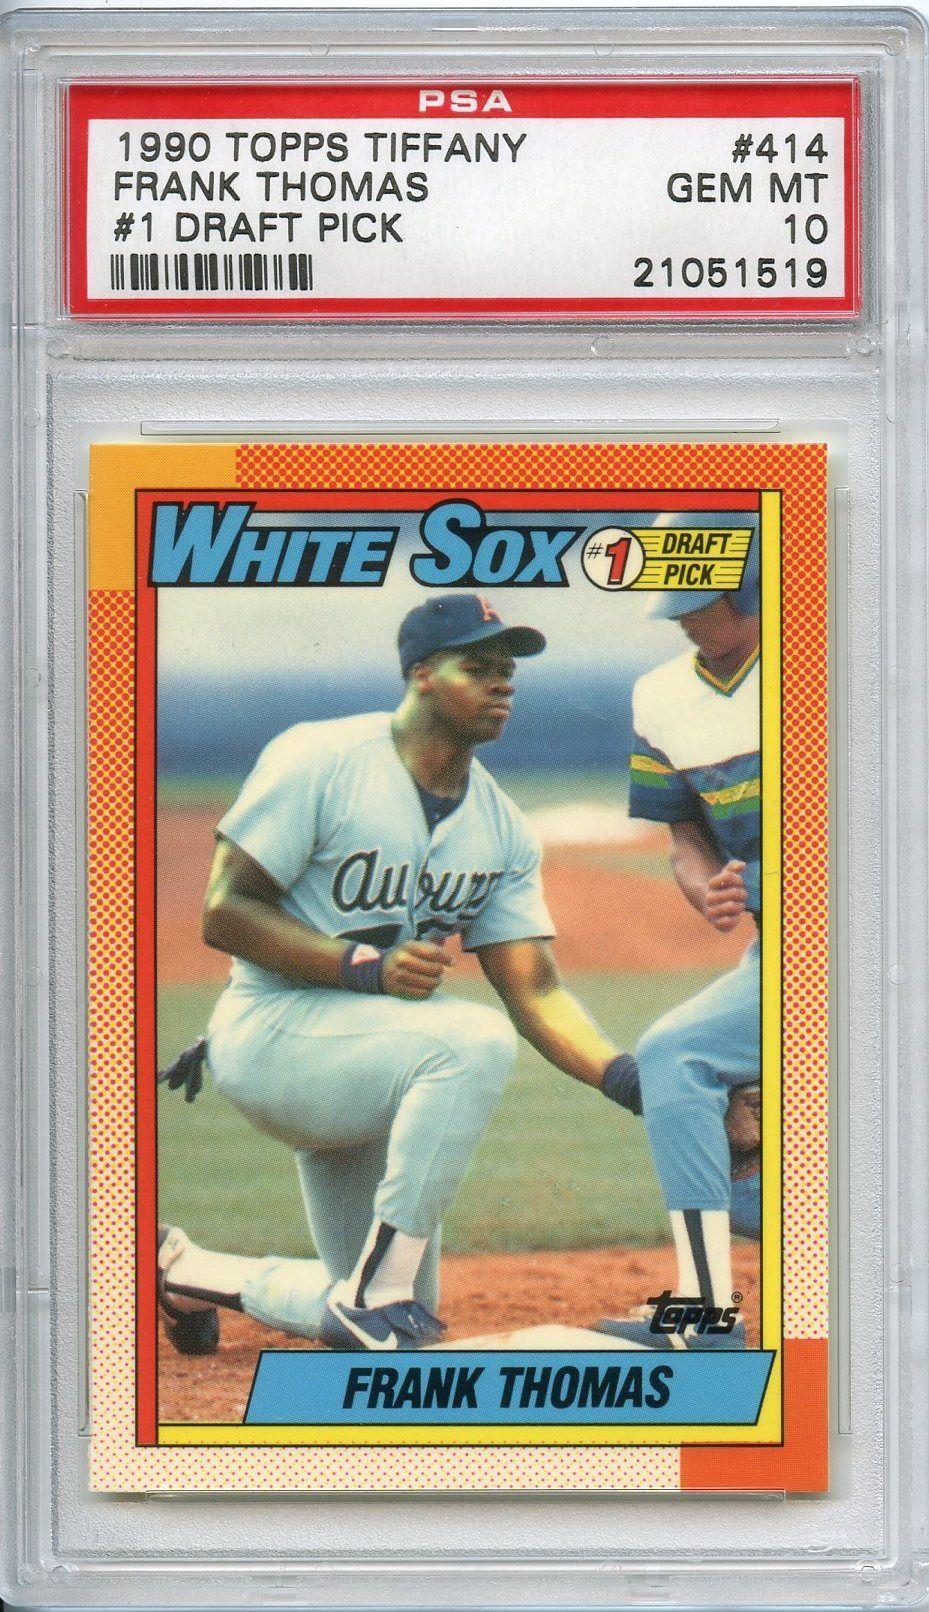 Image Result For 1990 Topps Frank Thomas Tiffany Baseball Cards